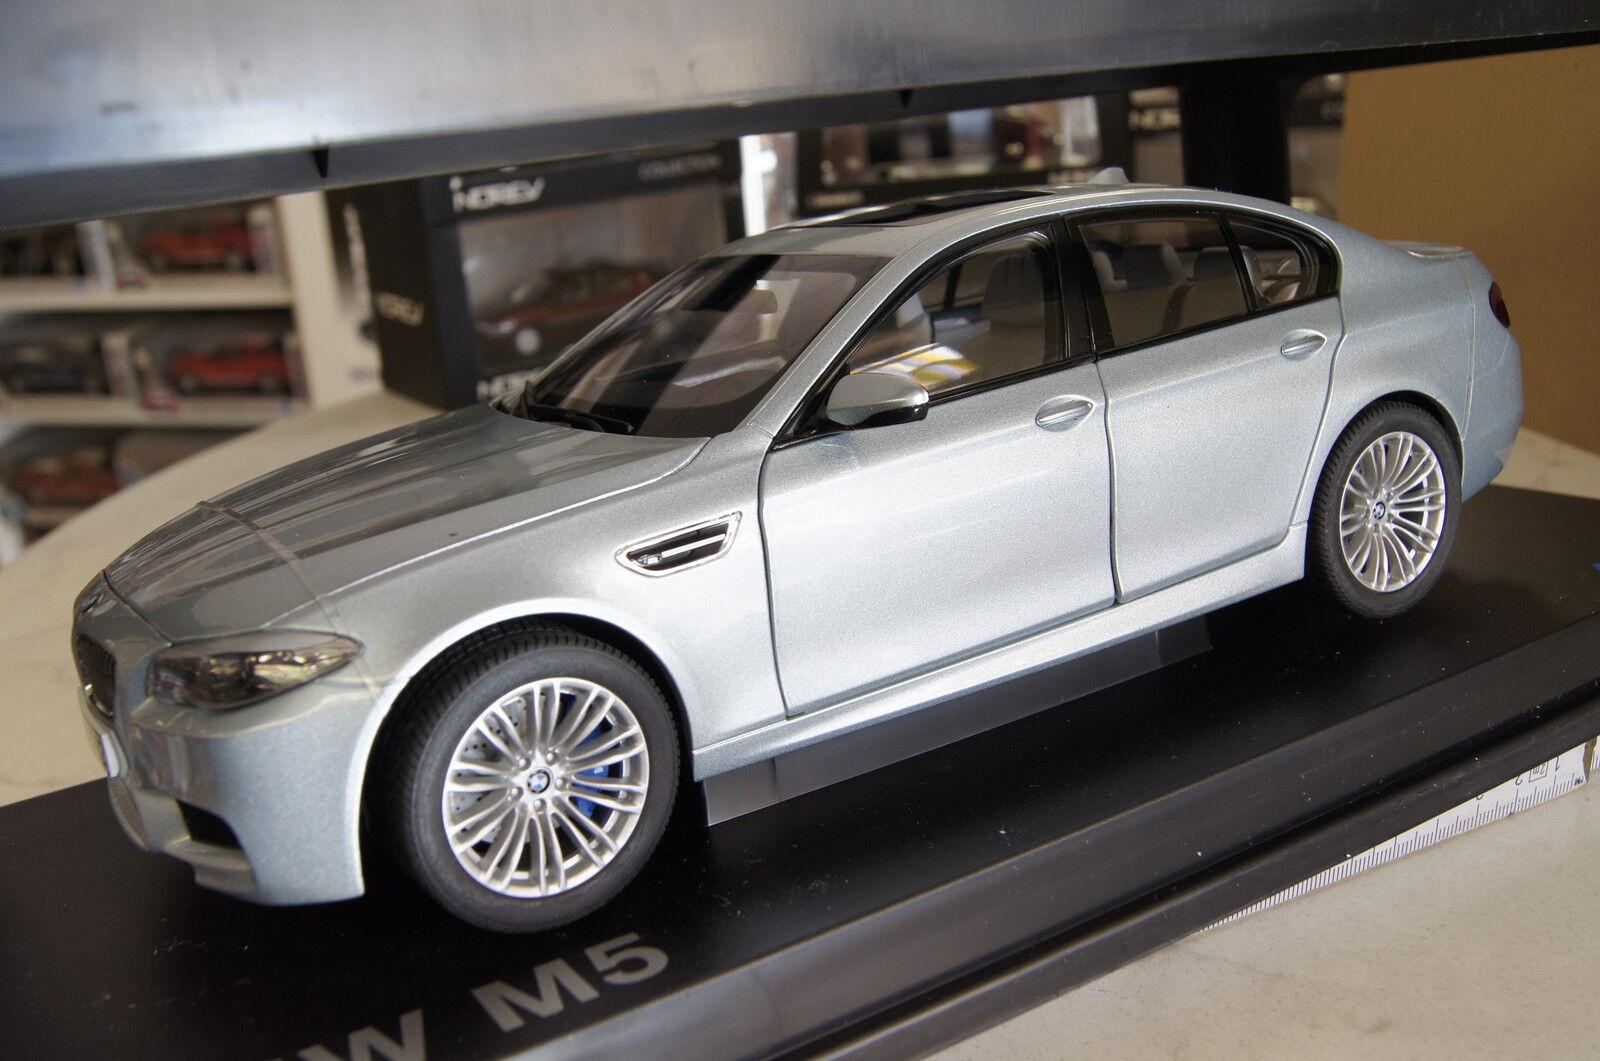 BMW m5 f10 argentoO METALLIZZATO 2011 Paragon Paragon Paragon BMW 1 18 NUOVO & OVP 48d4af